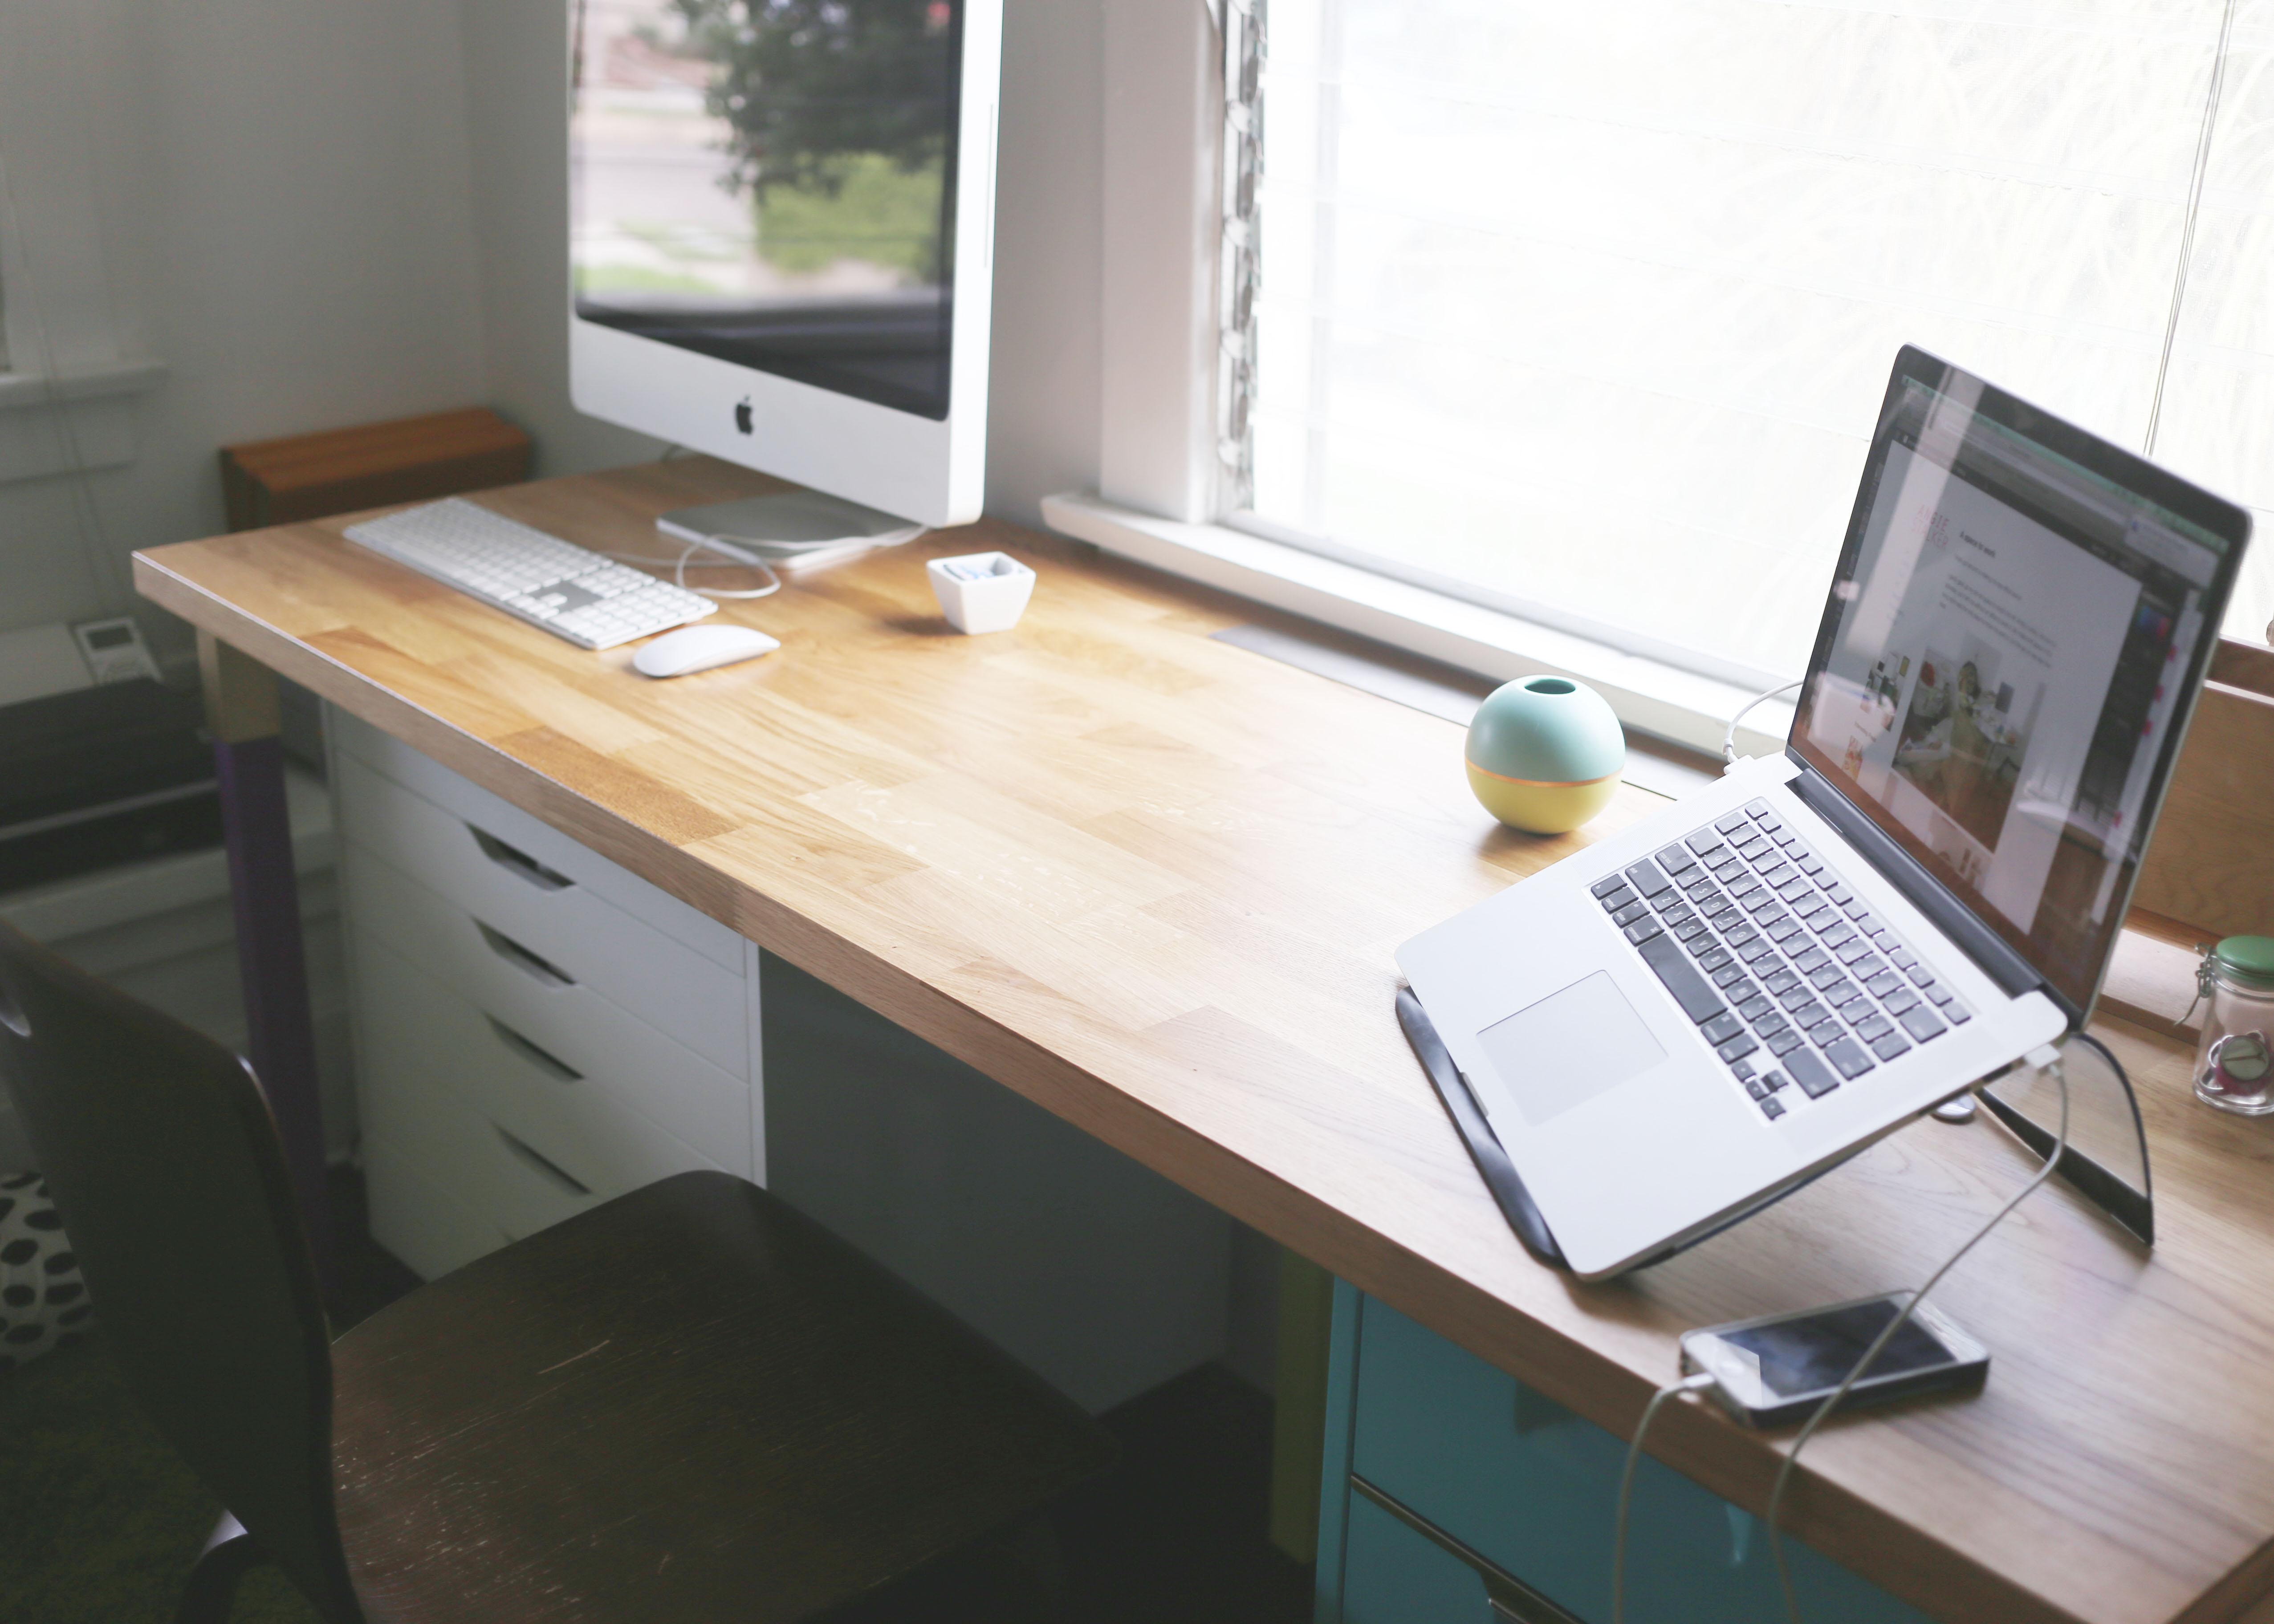 kitchen countertop desk DJ*azgJwqyDlljKaNVEQtJjvQpIHFO 7CjA ikea kitchen countertops Space